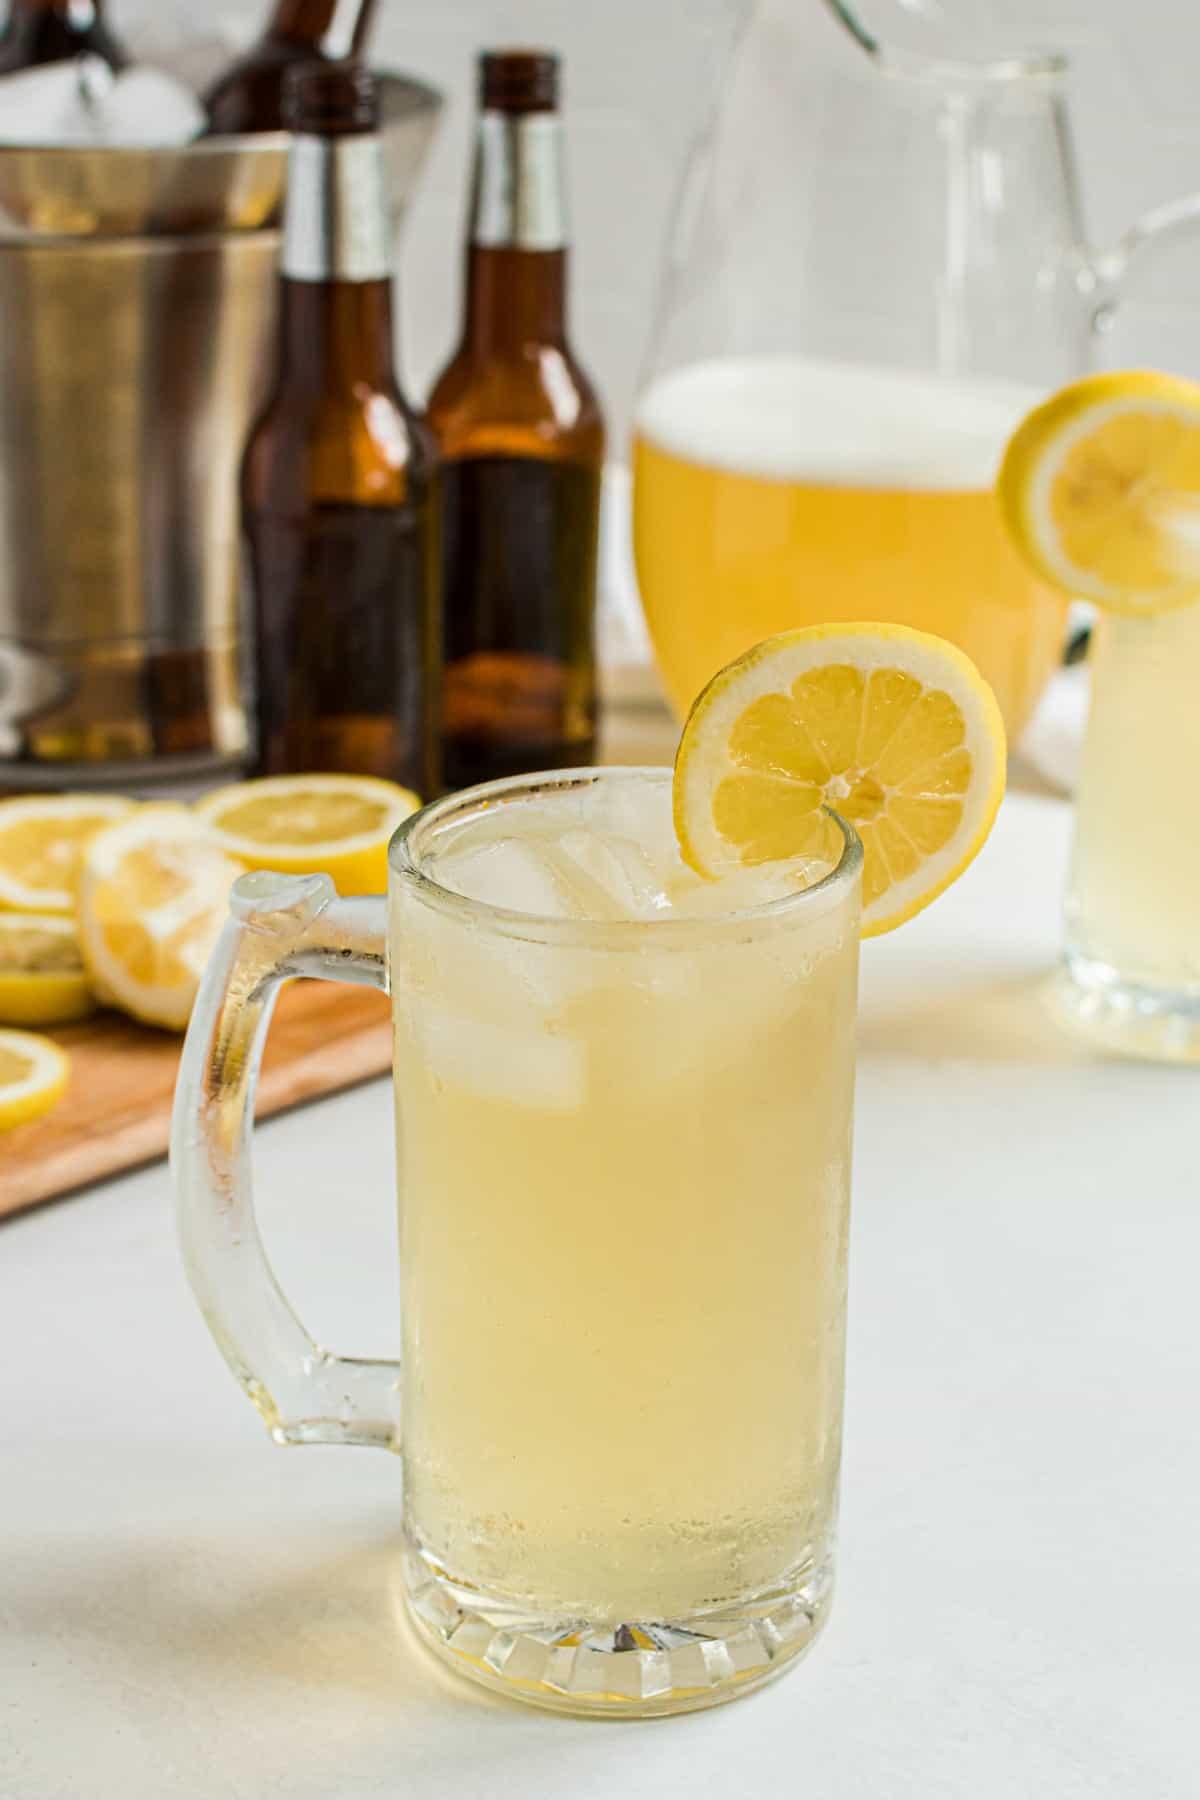 Beer mug with homemade summer shandy, garnished with a lemon slice.